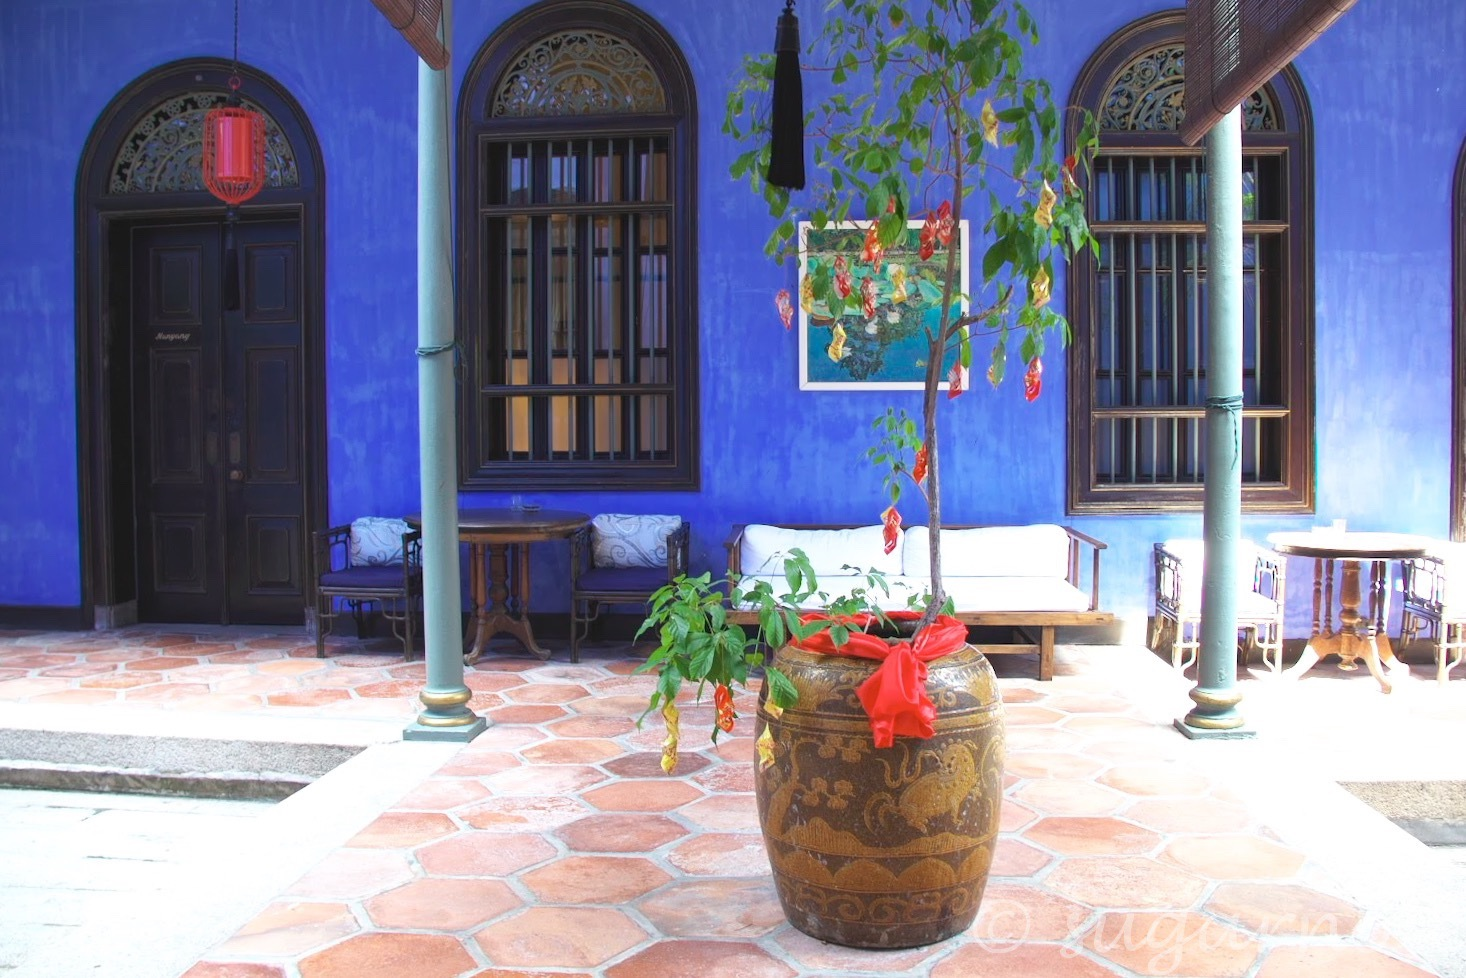 The Blue Mansion, ブルーマンション